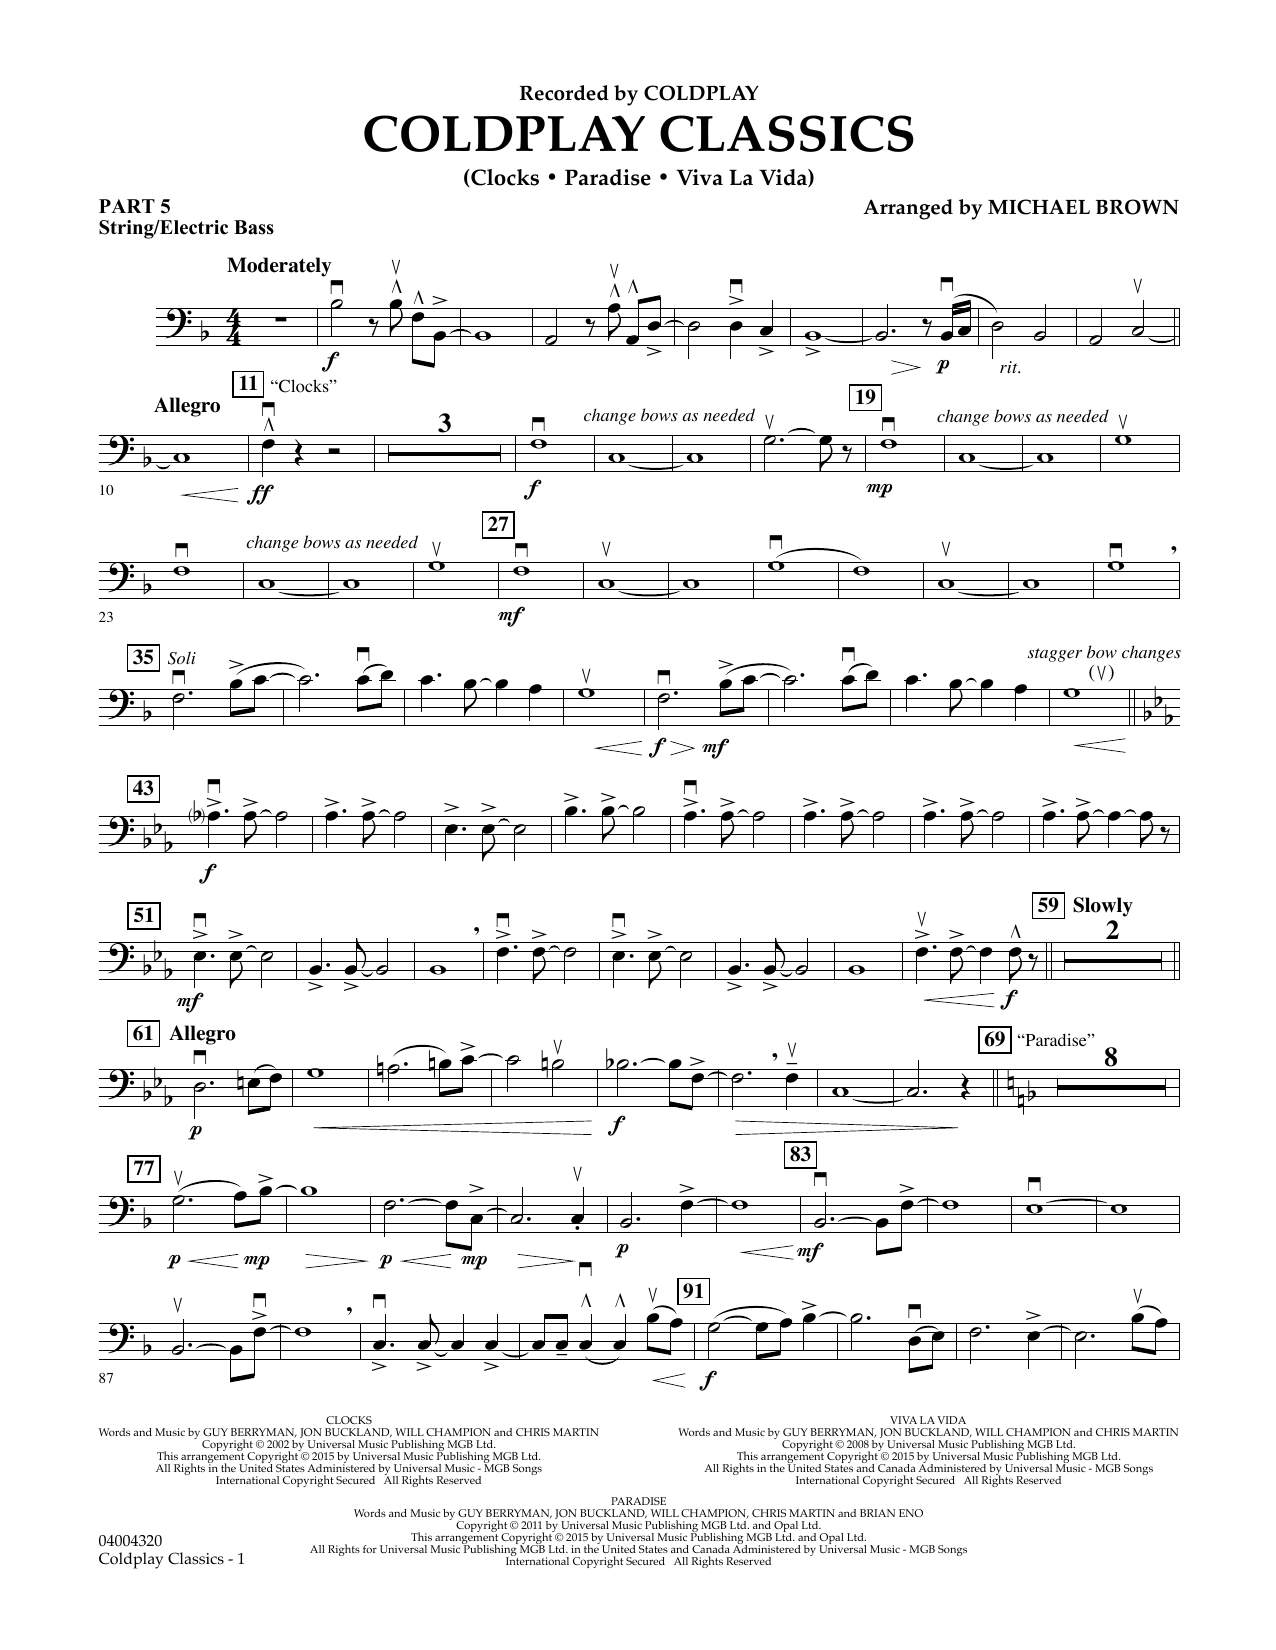 Coldplay Classics - Pt.5 - String/Electric Bass (Flex-Band)